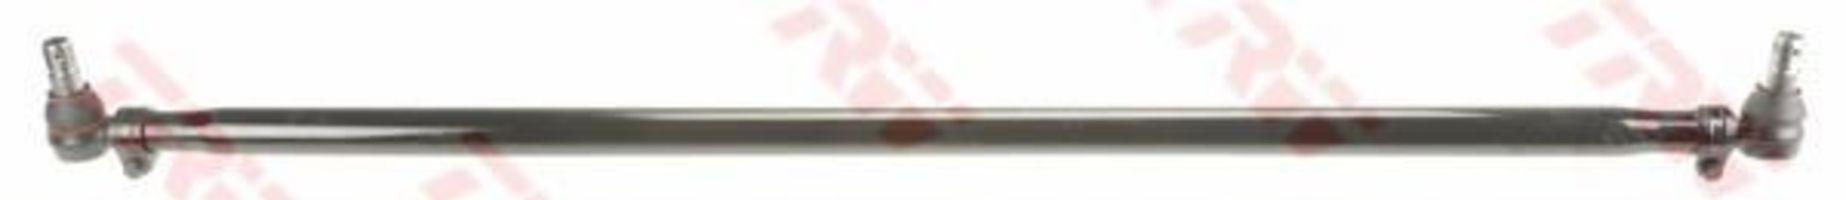 Поперечная рулевая тяга TRW JTR0292